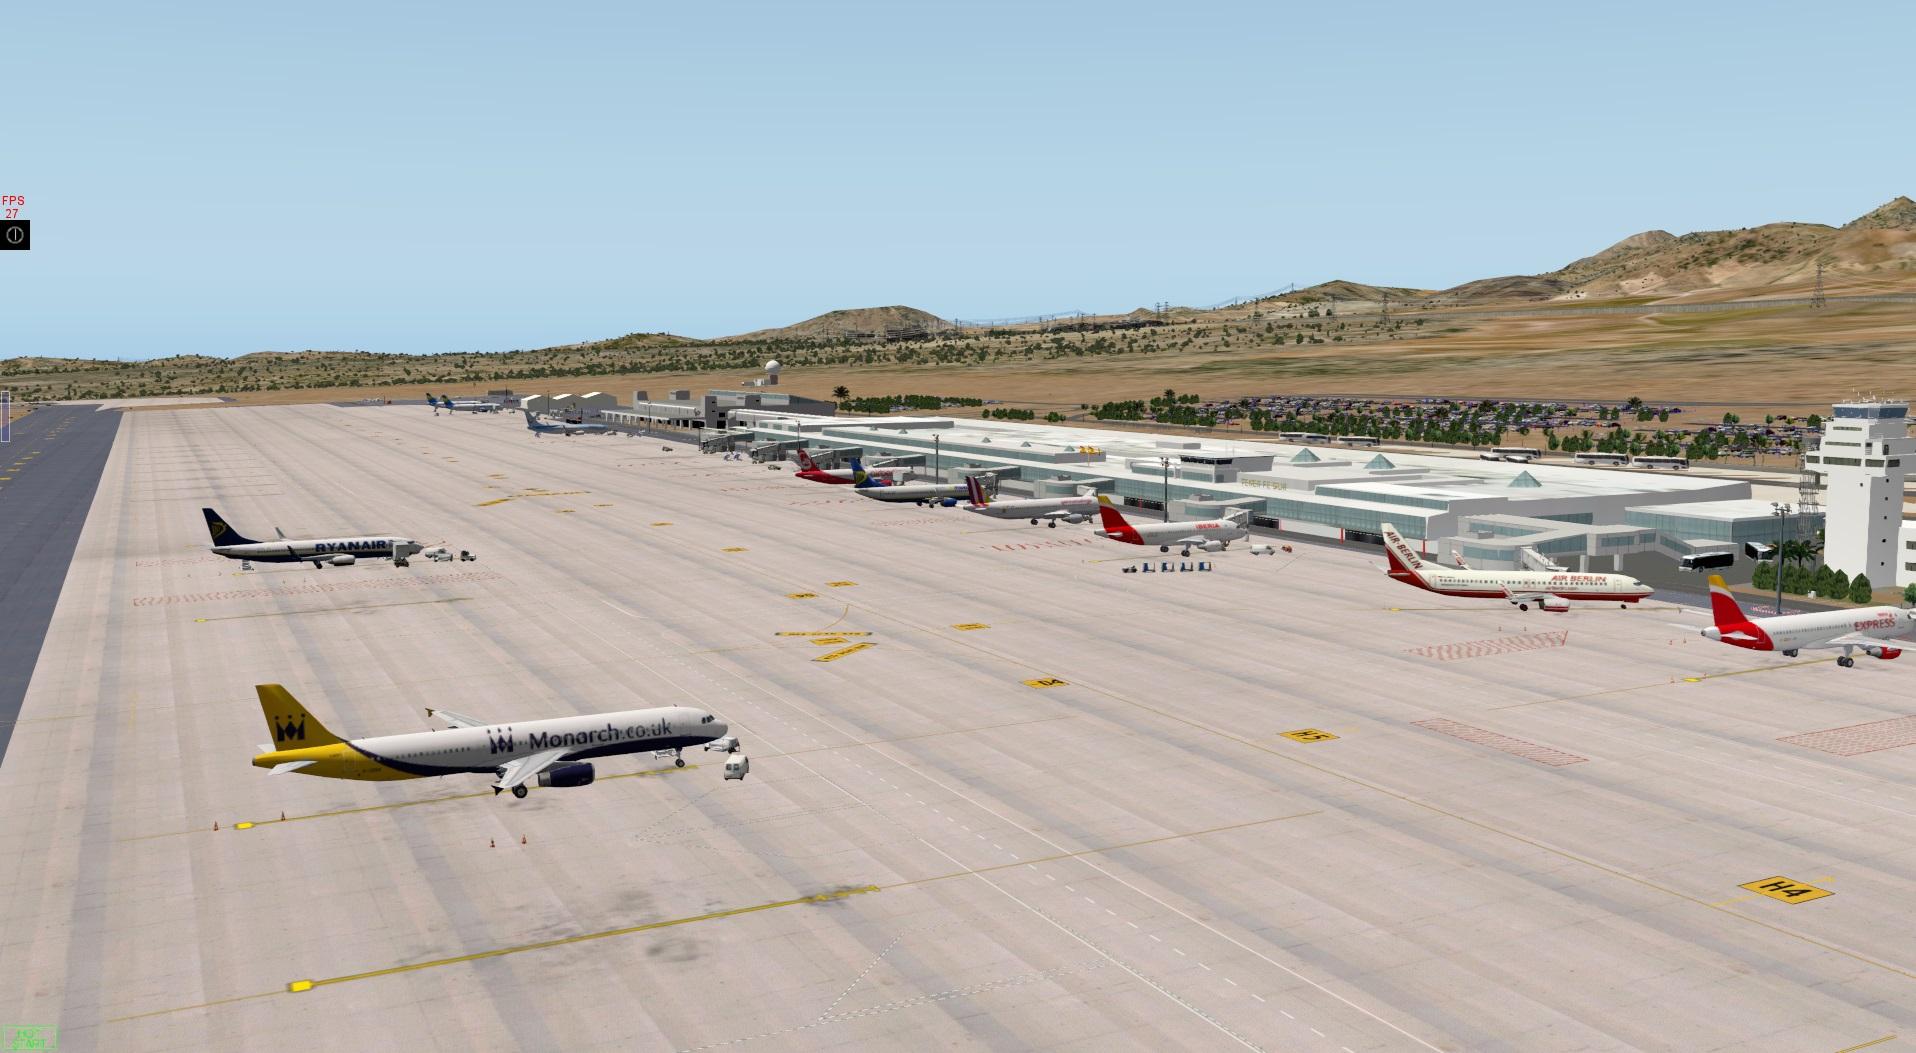 Aeroporto Tenerife Sud : Gcts tenerife south scenery packages v11 v 10 v9 x plane.org